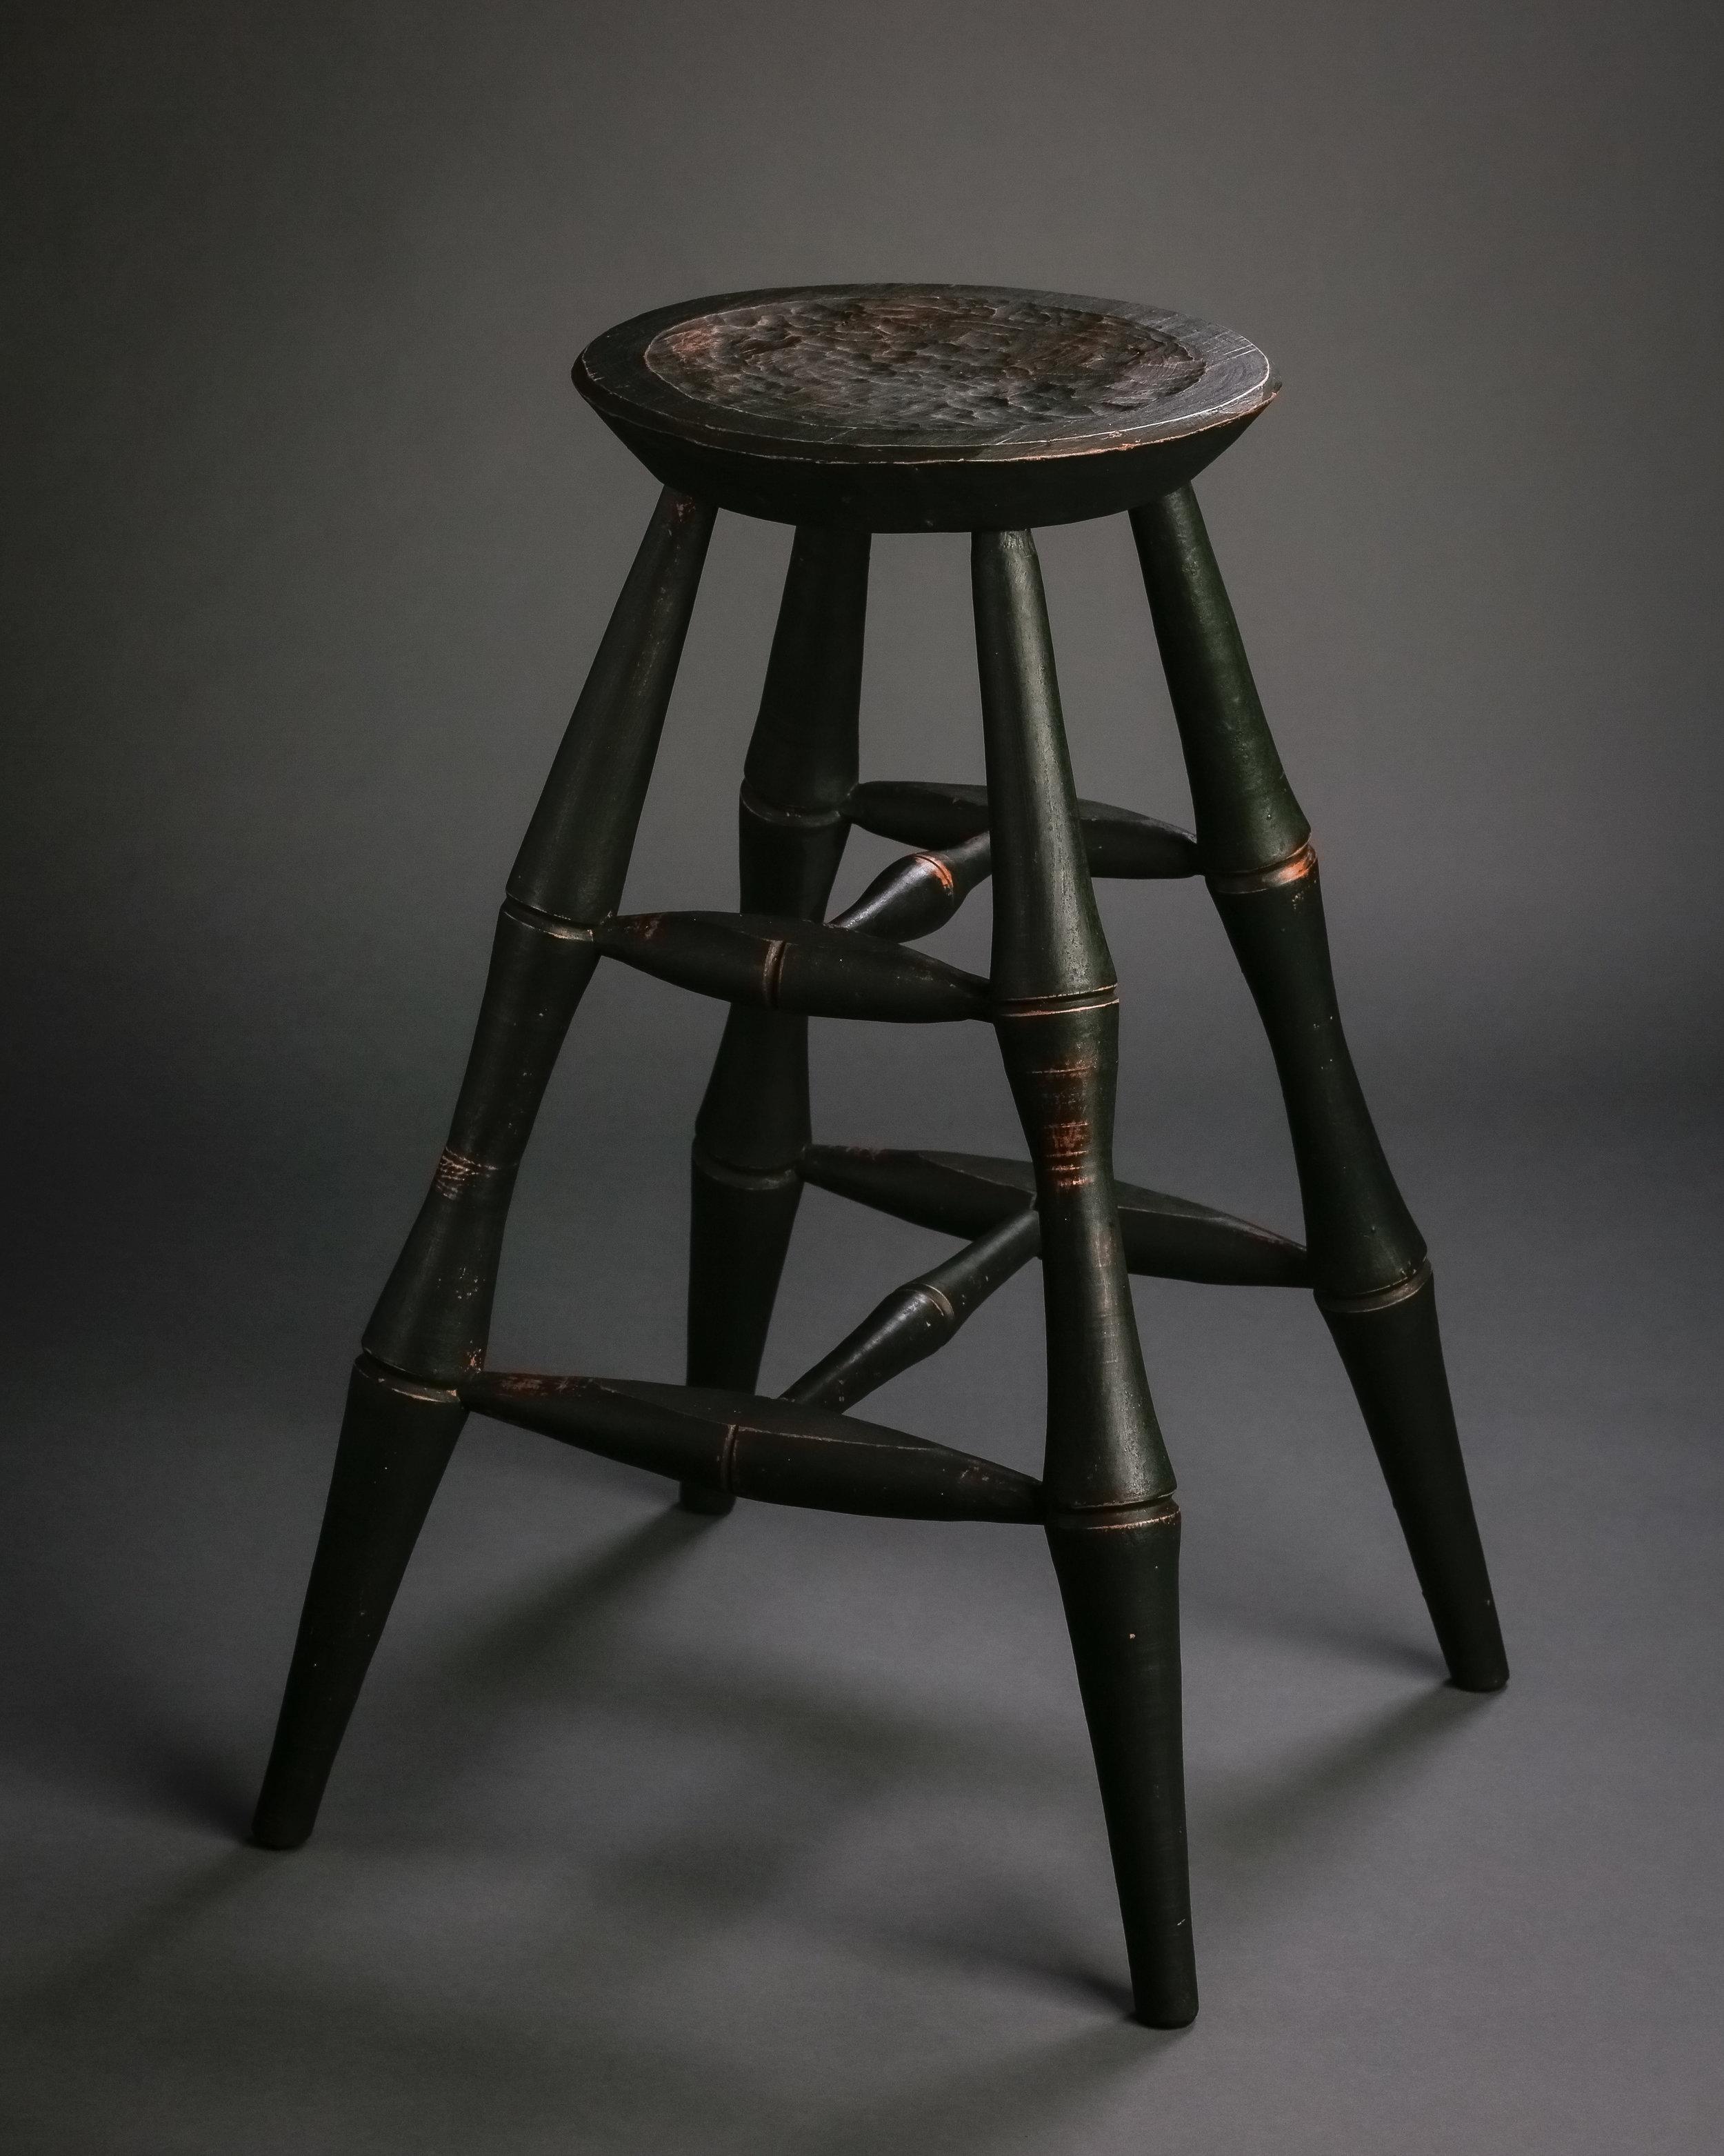 Ladder Stool